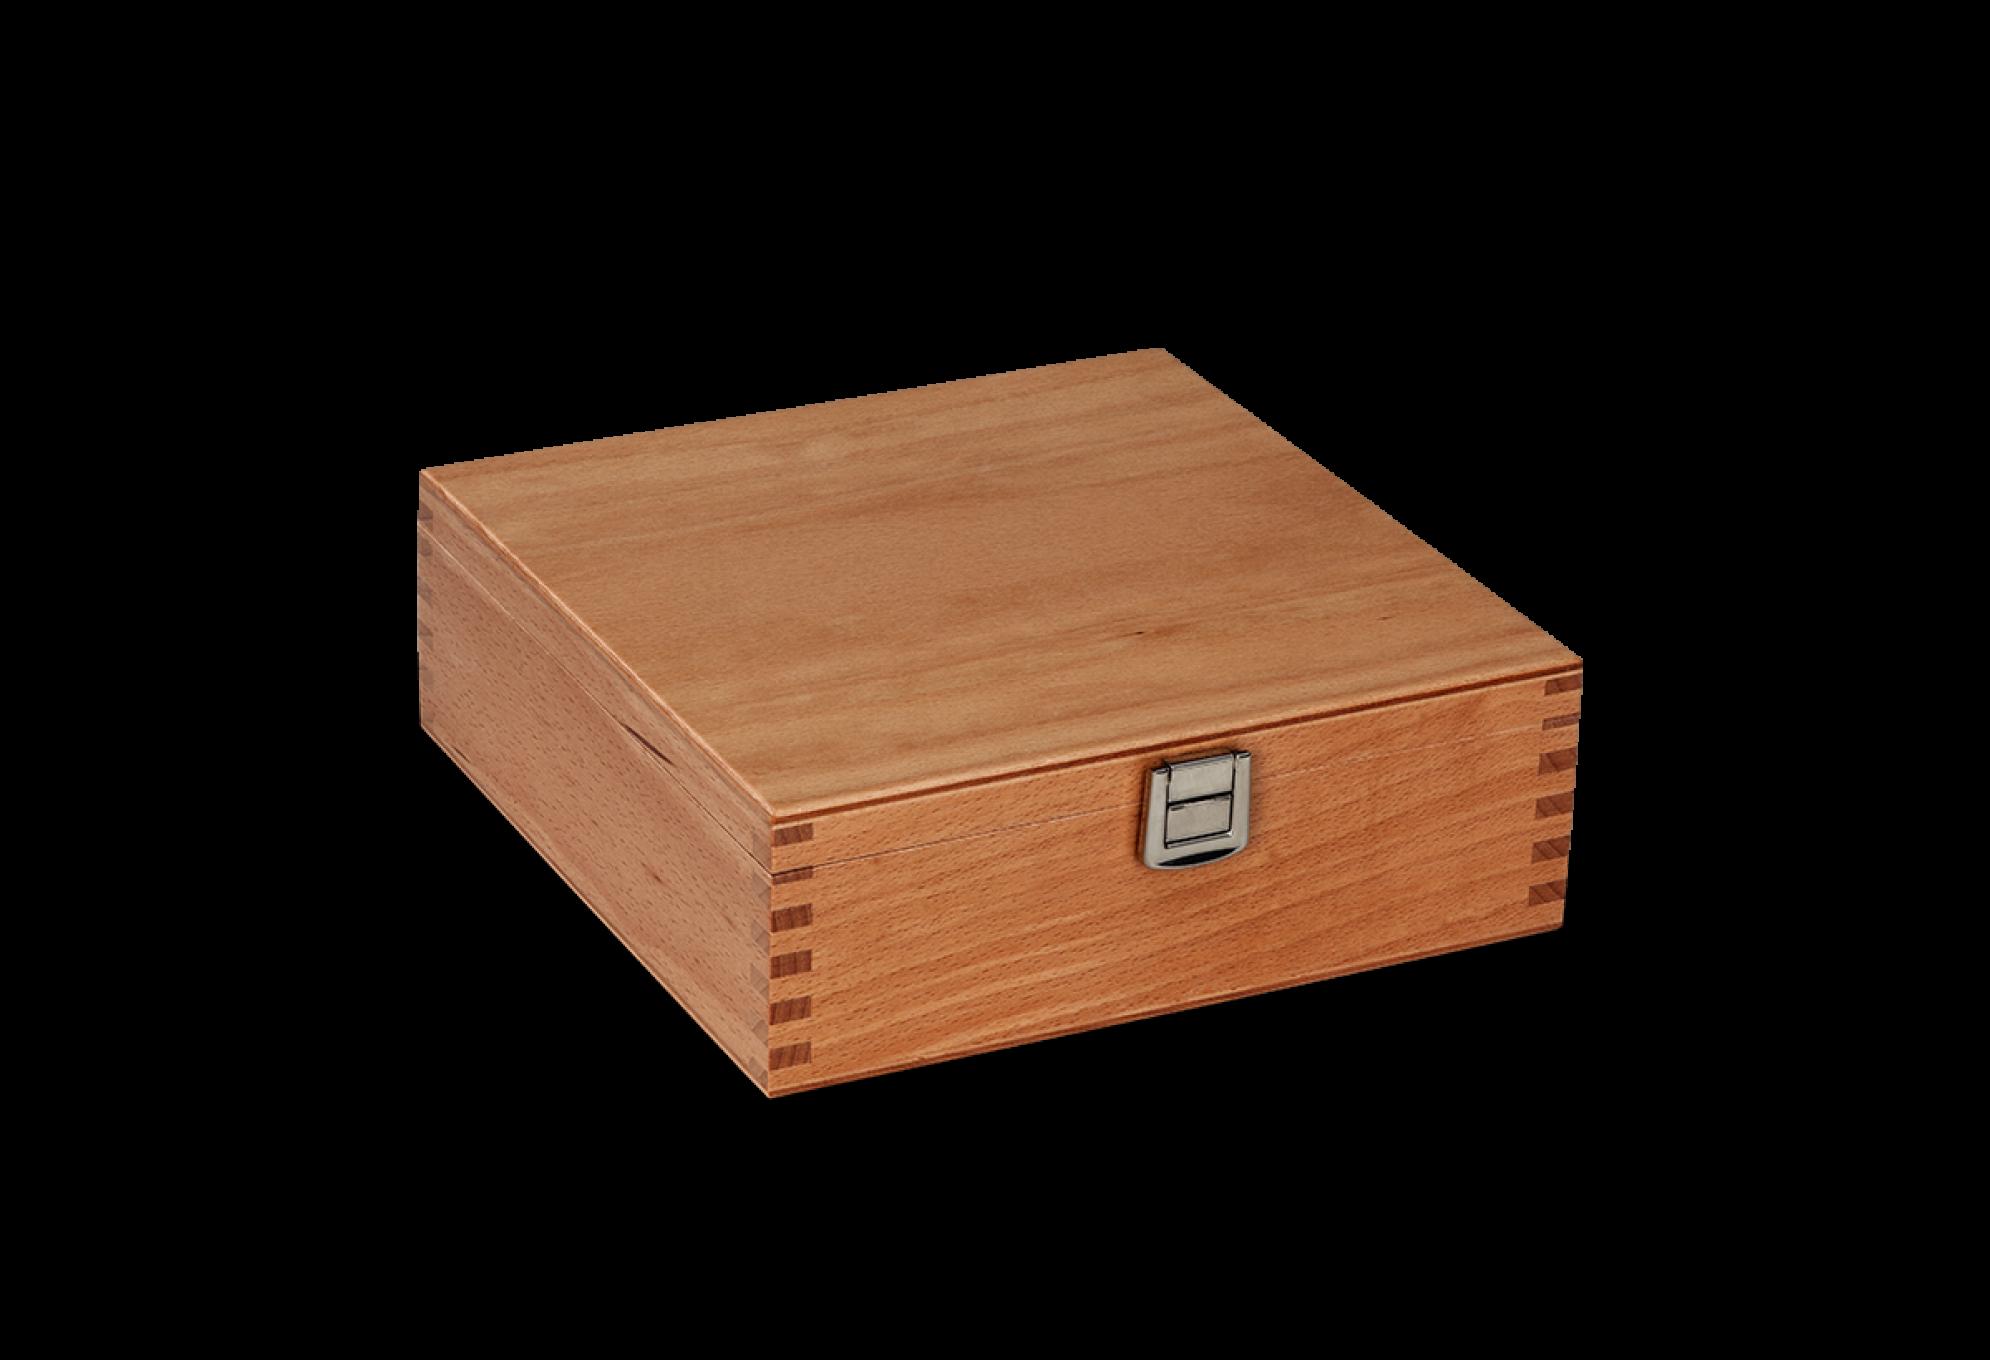 Exclusive Wooden Cassettes Cases And Caskets Scheffauer